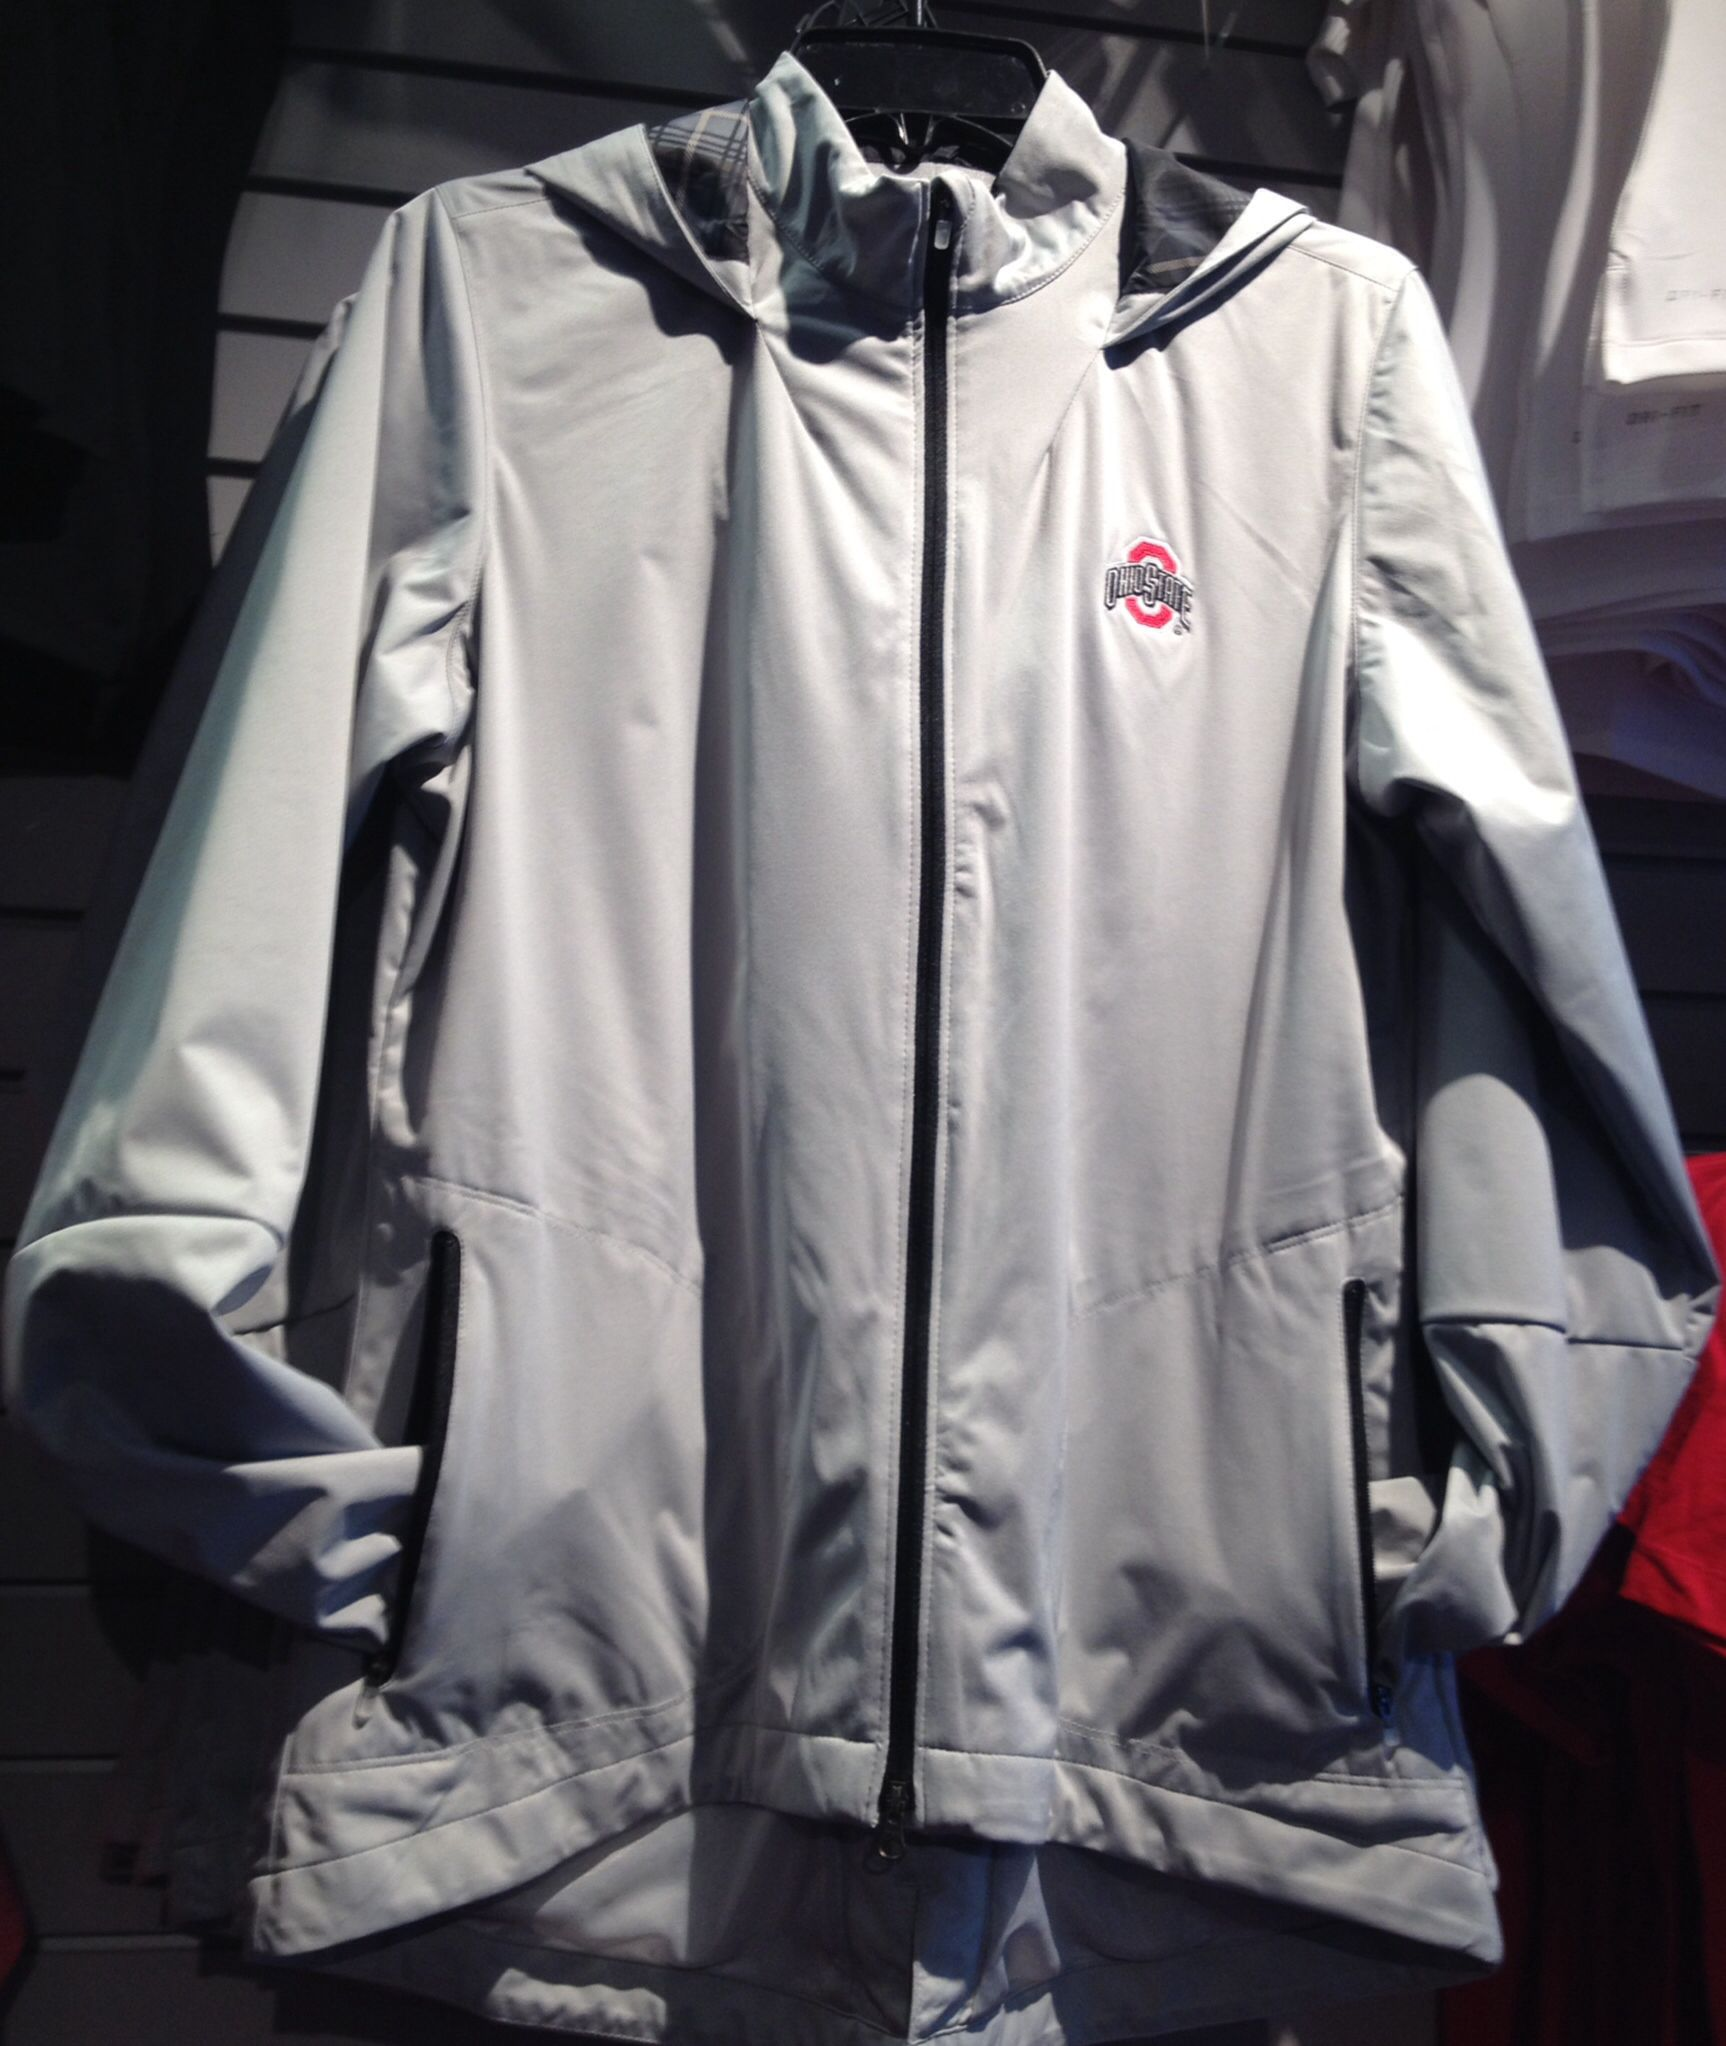 Osu Sports Outerwear Jacket Nike Jacket Athletic Jacket Outerwear Jackets [ 2046 x 1726 Pixel ]